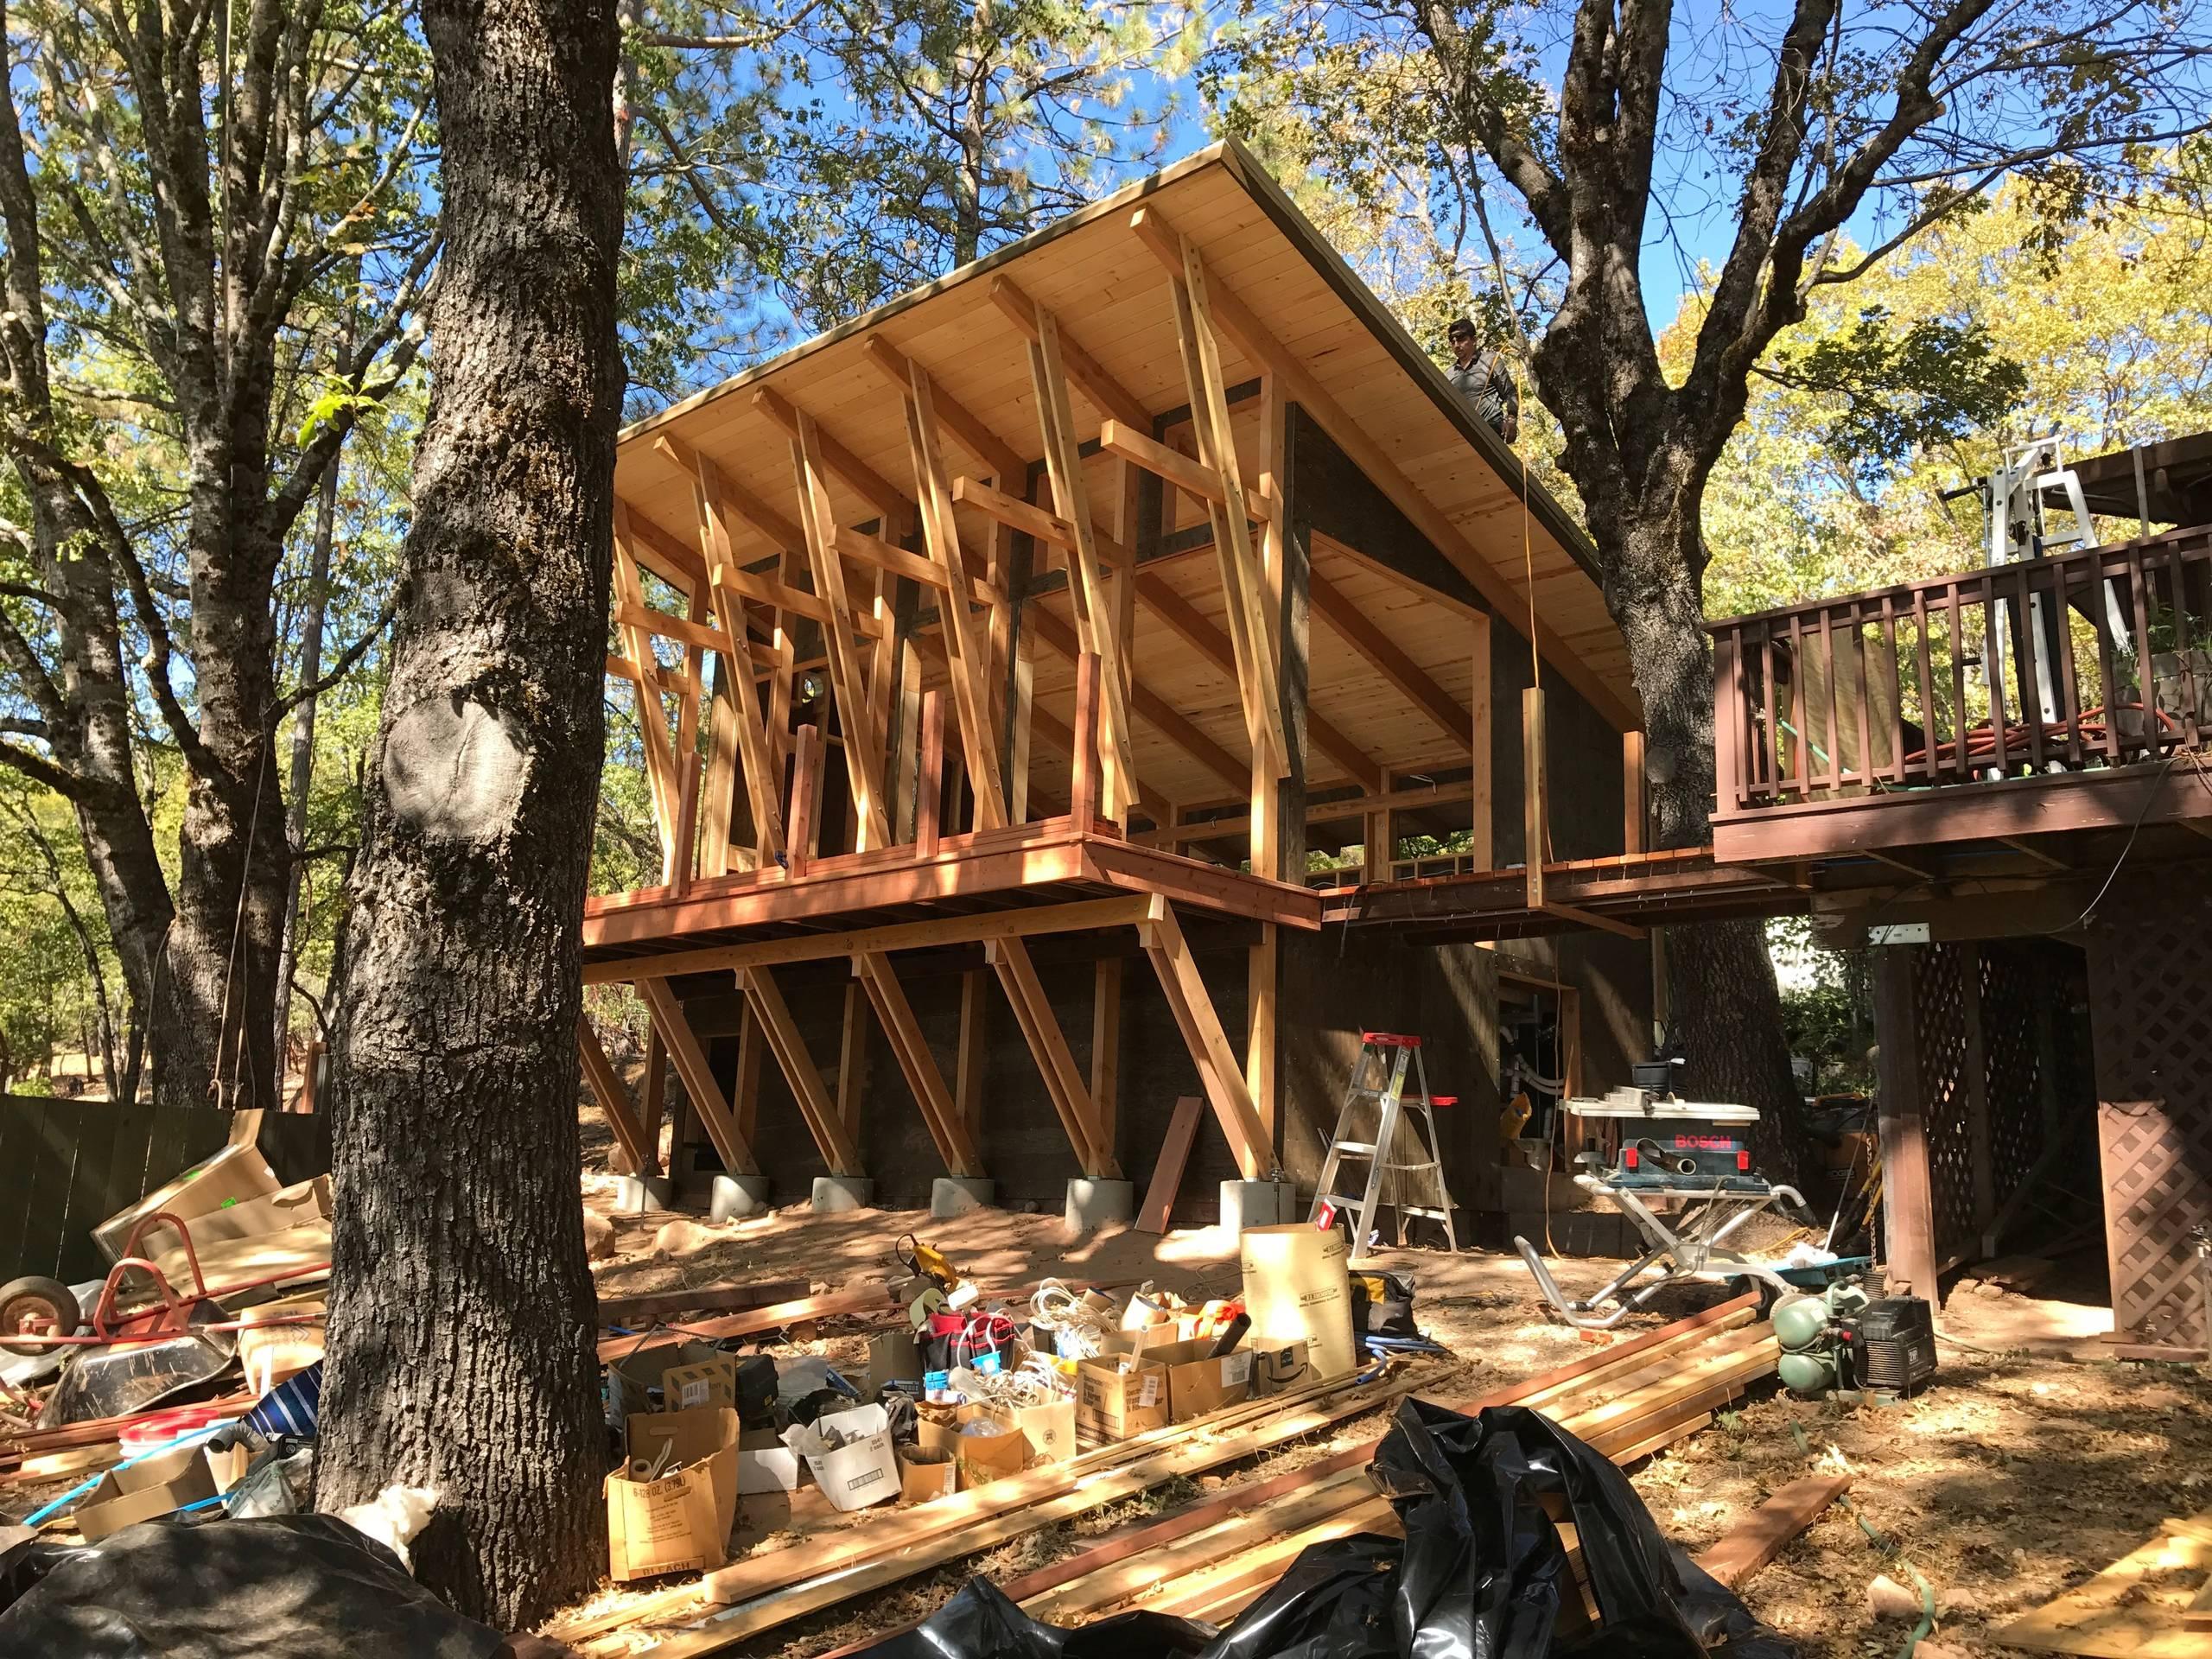 Cobb Mountain Pool House - construction photo